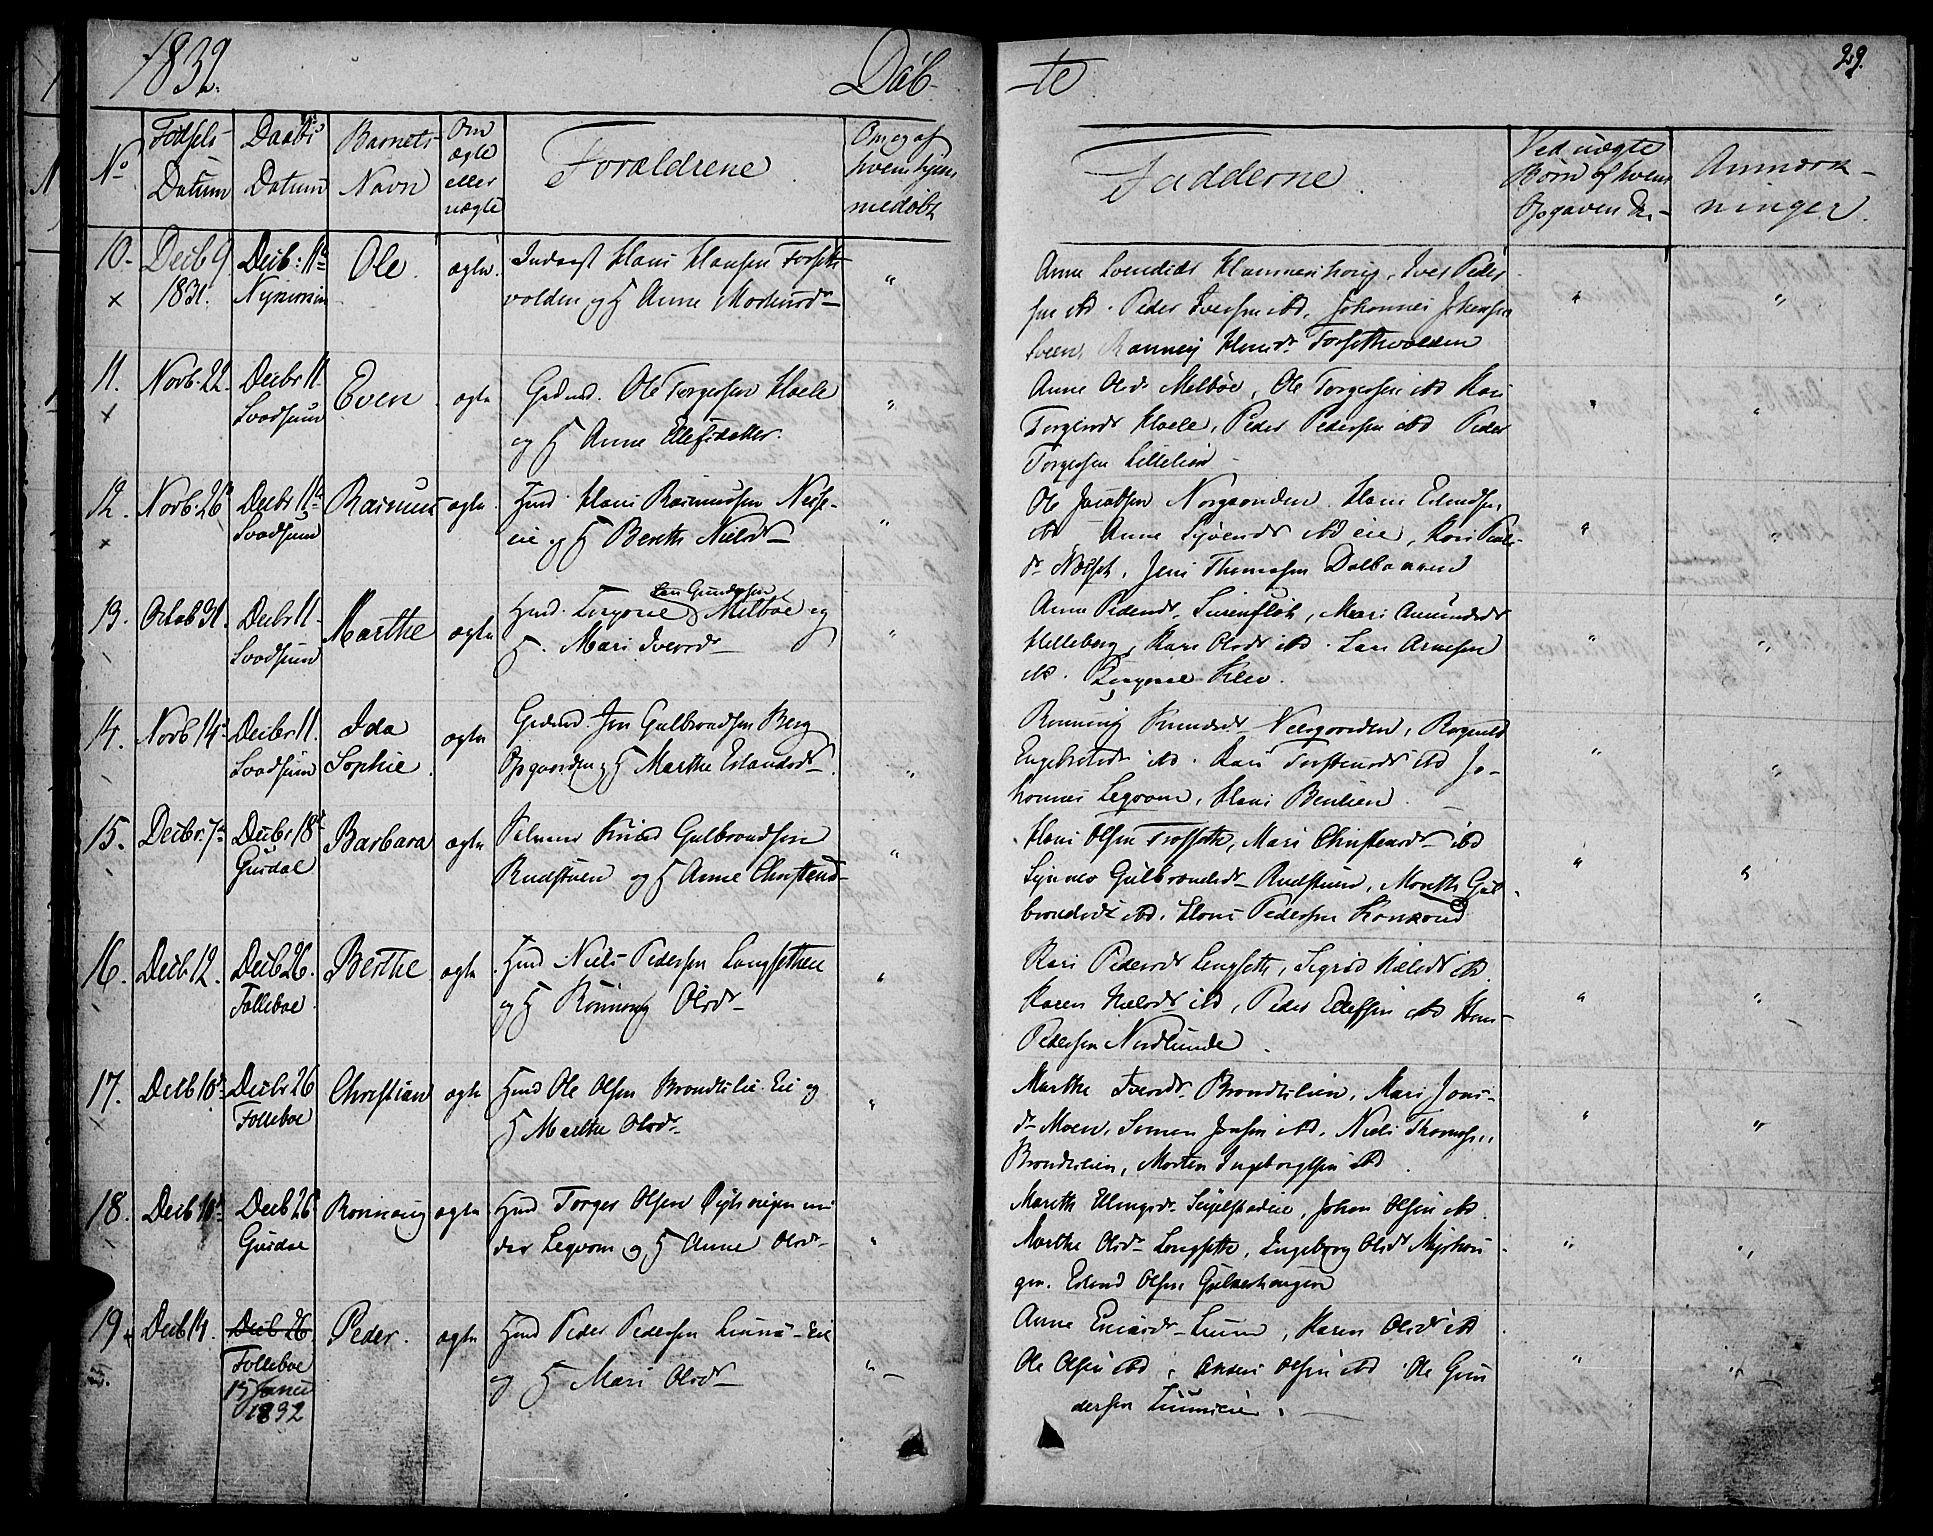 SAH, Gausdal prestekontor, Ministerialbok nr. 6, 1830-1839, s. 29